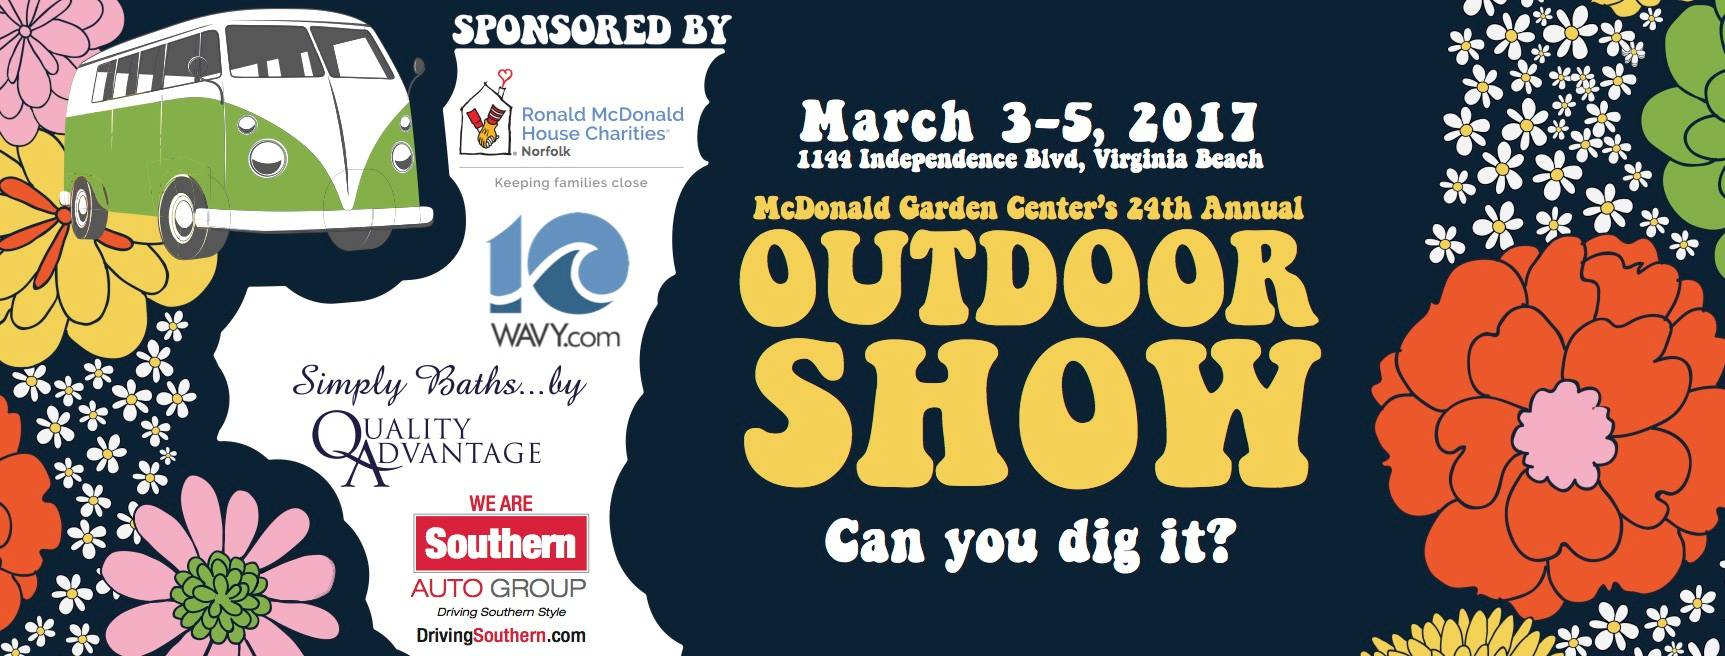 McDonald Garden Center Outdoor Show 2017 U2013 HrScene